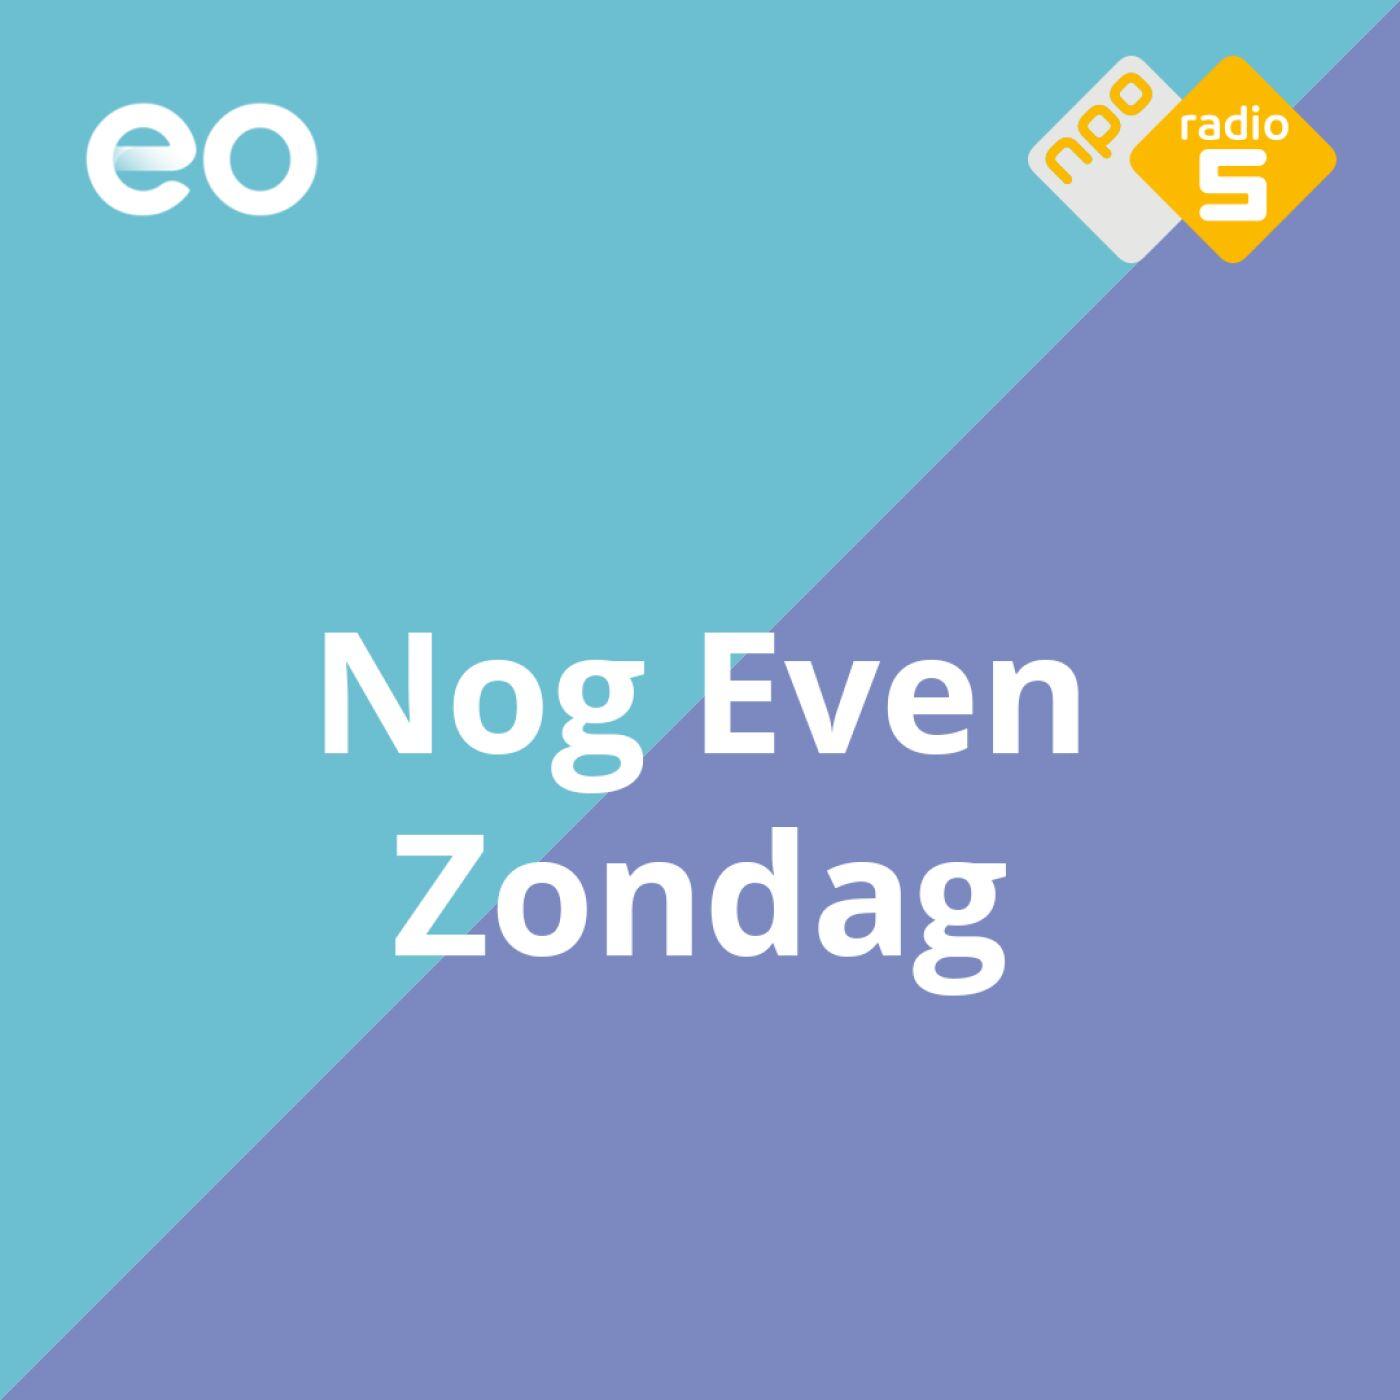 Nog Even Zondag logo